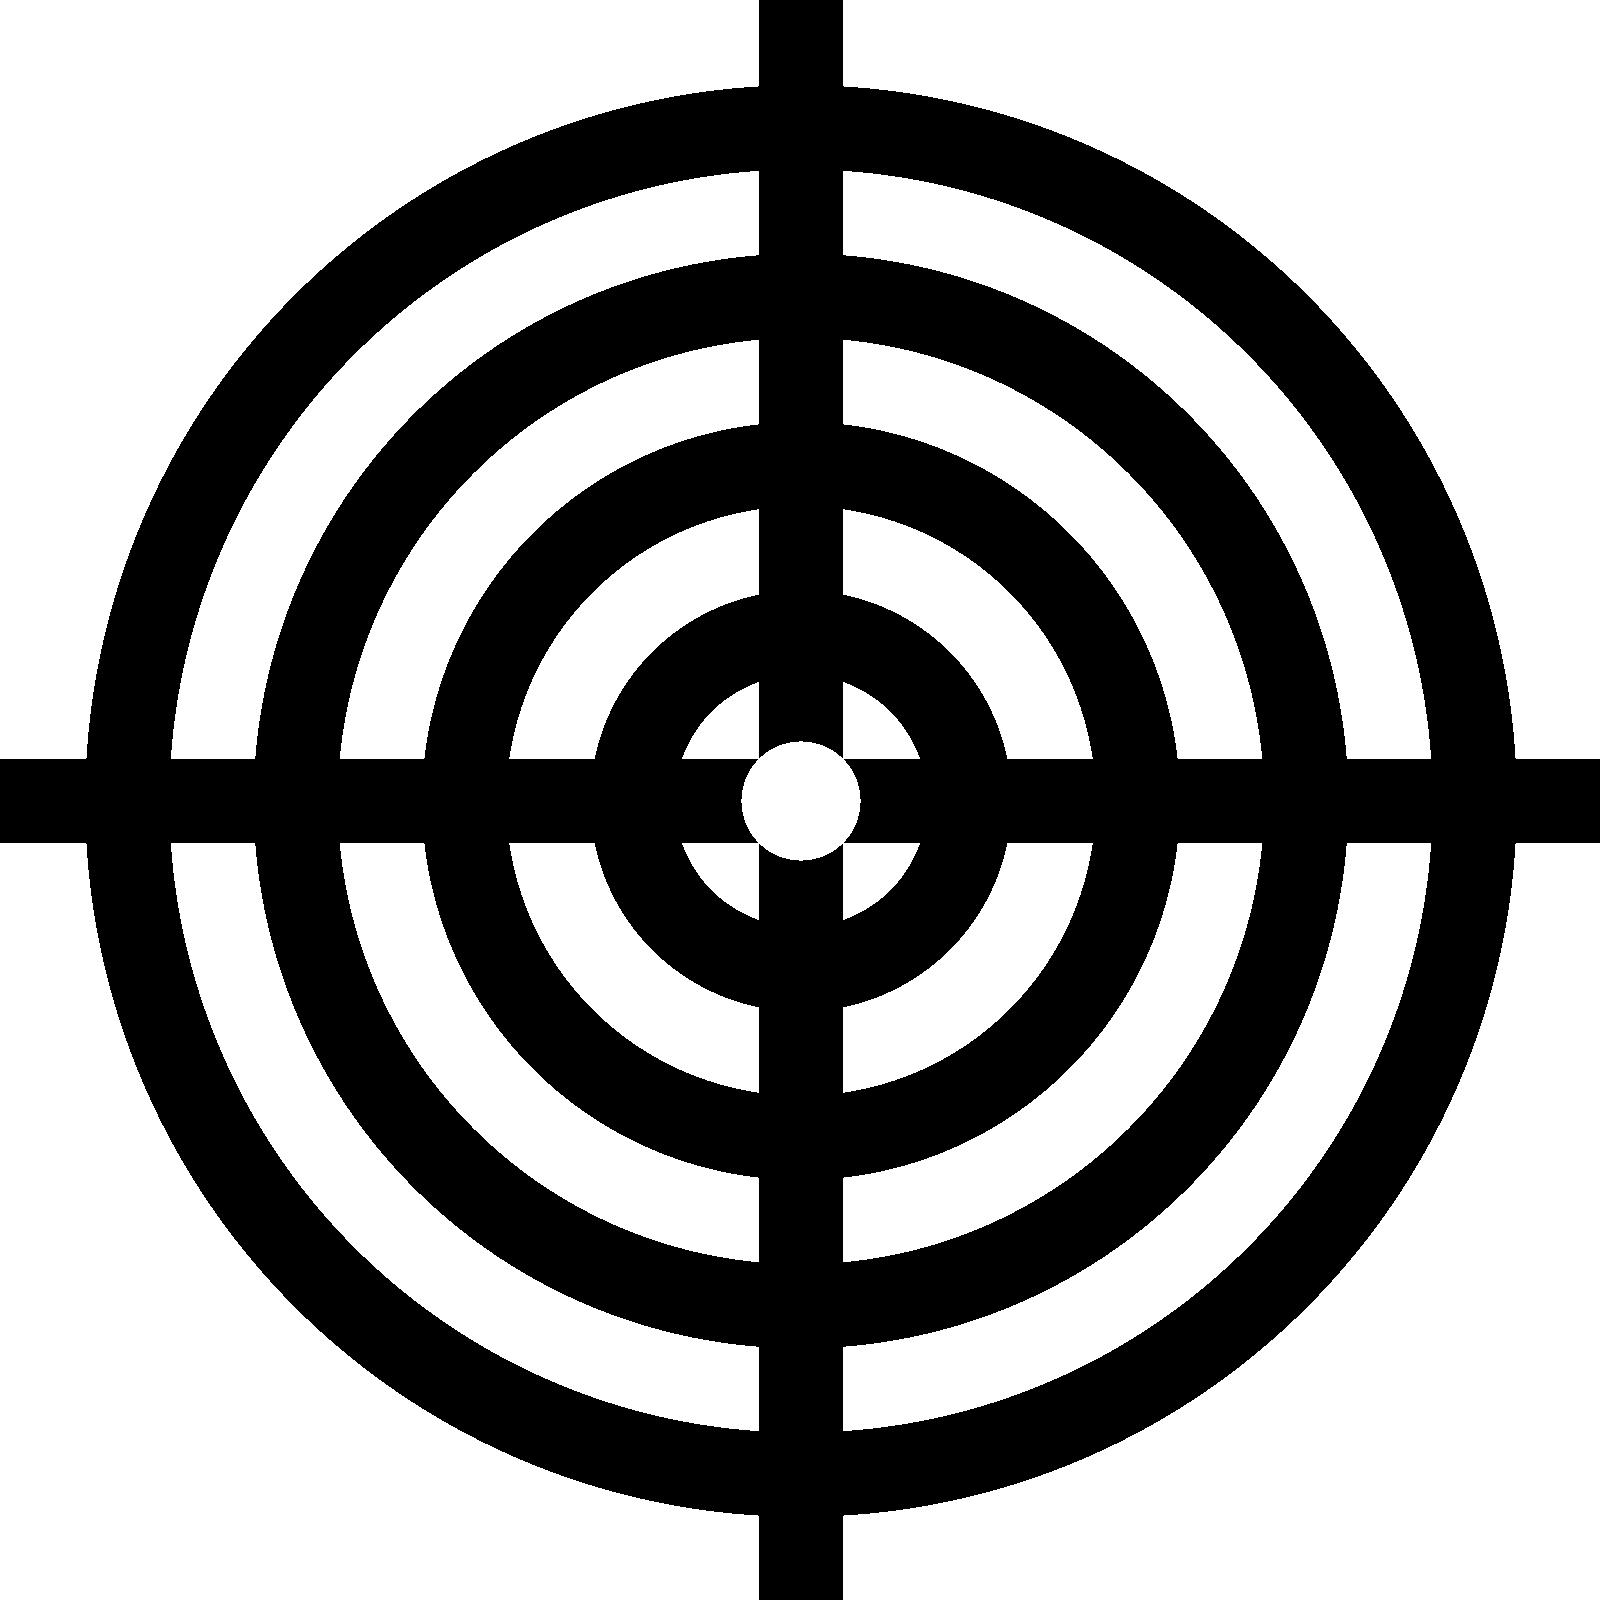 Index of /kenta/www/three/target/brzolmsf